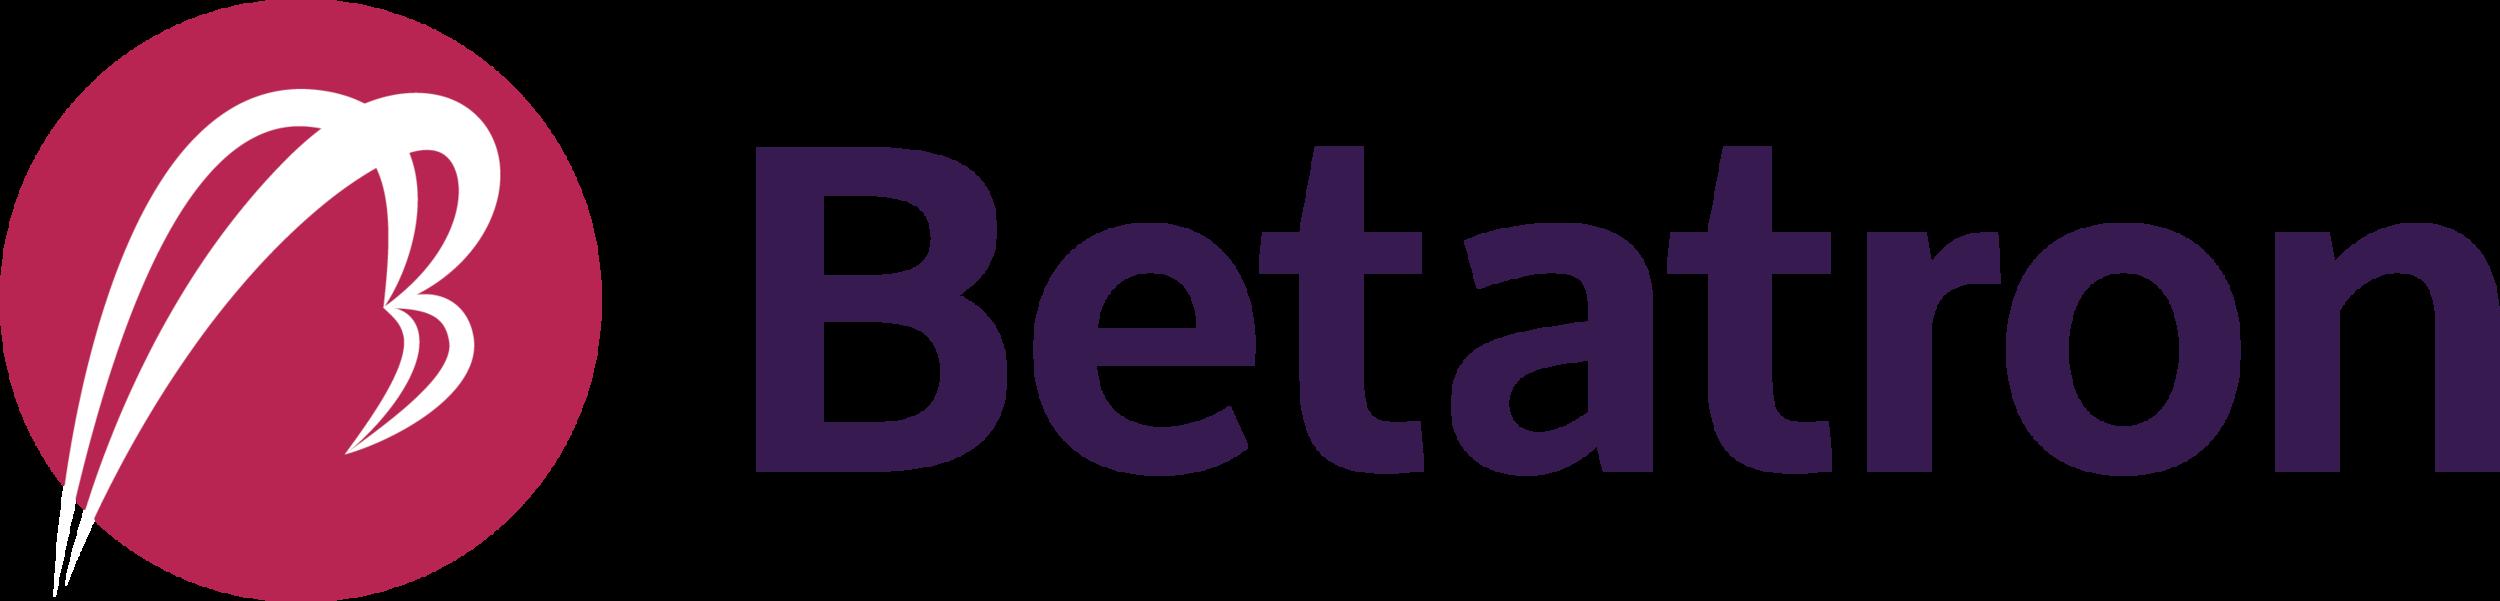 Betatron-Logo.png